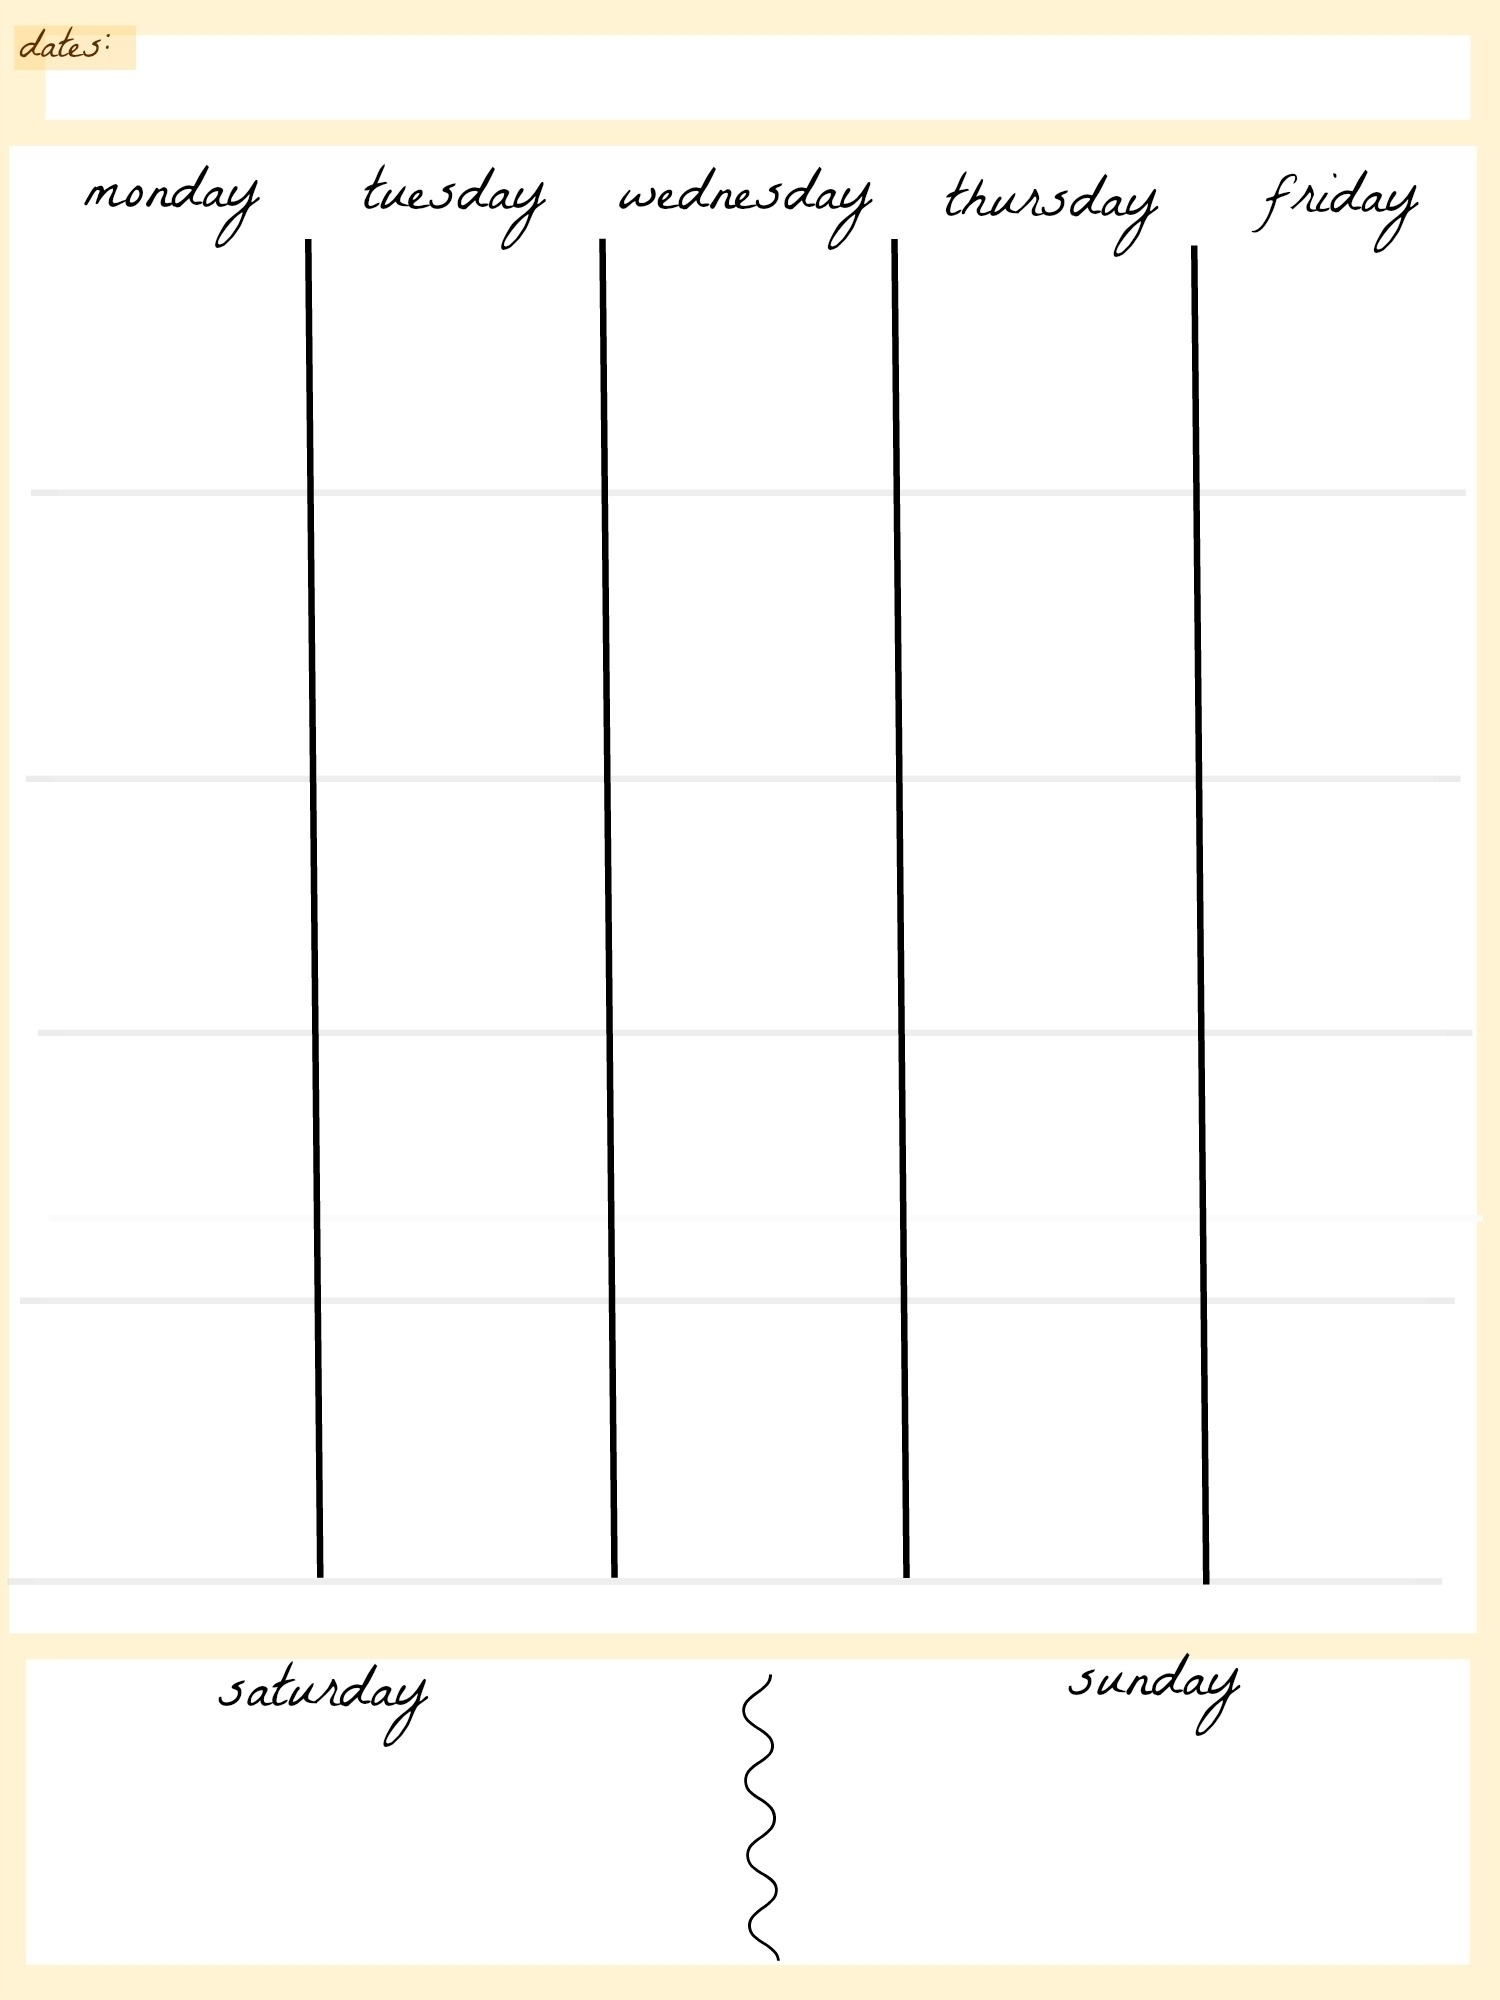 Free Printable Blank Weekly Calendar Templates | Template Calendar  Blank 4 Week Calendar Printable